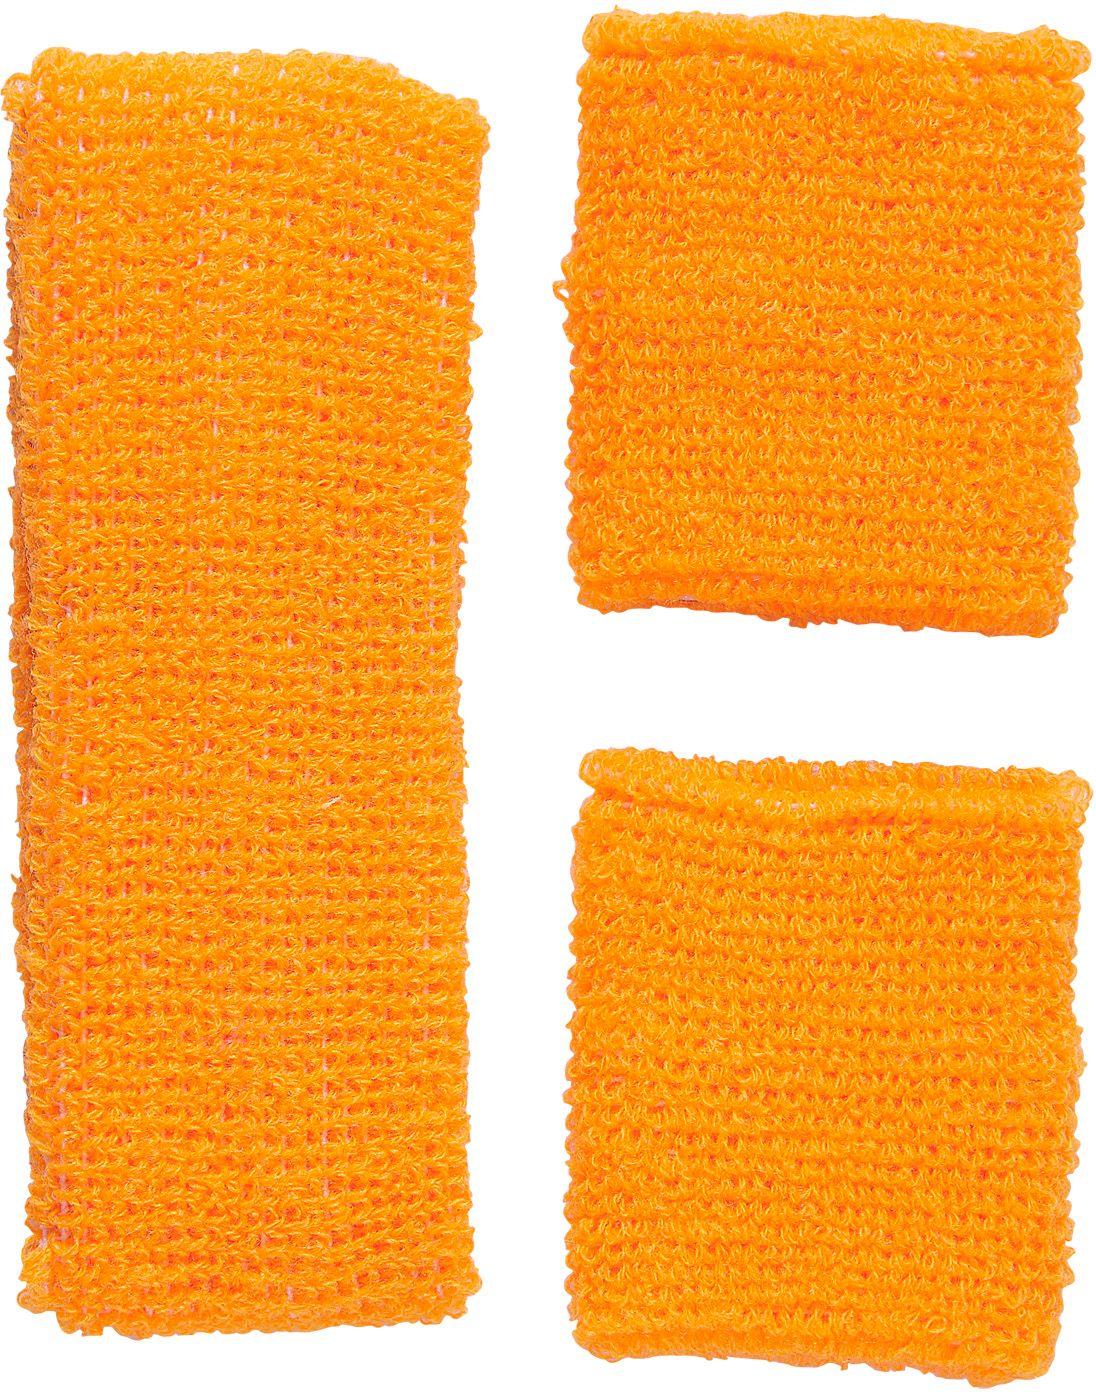 Neon oranje zweetband set